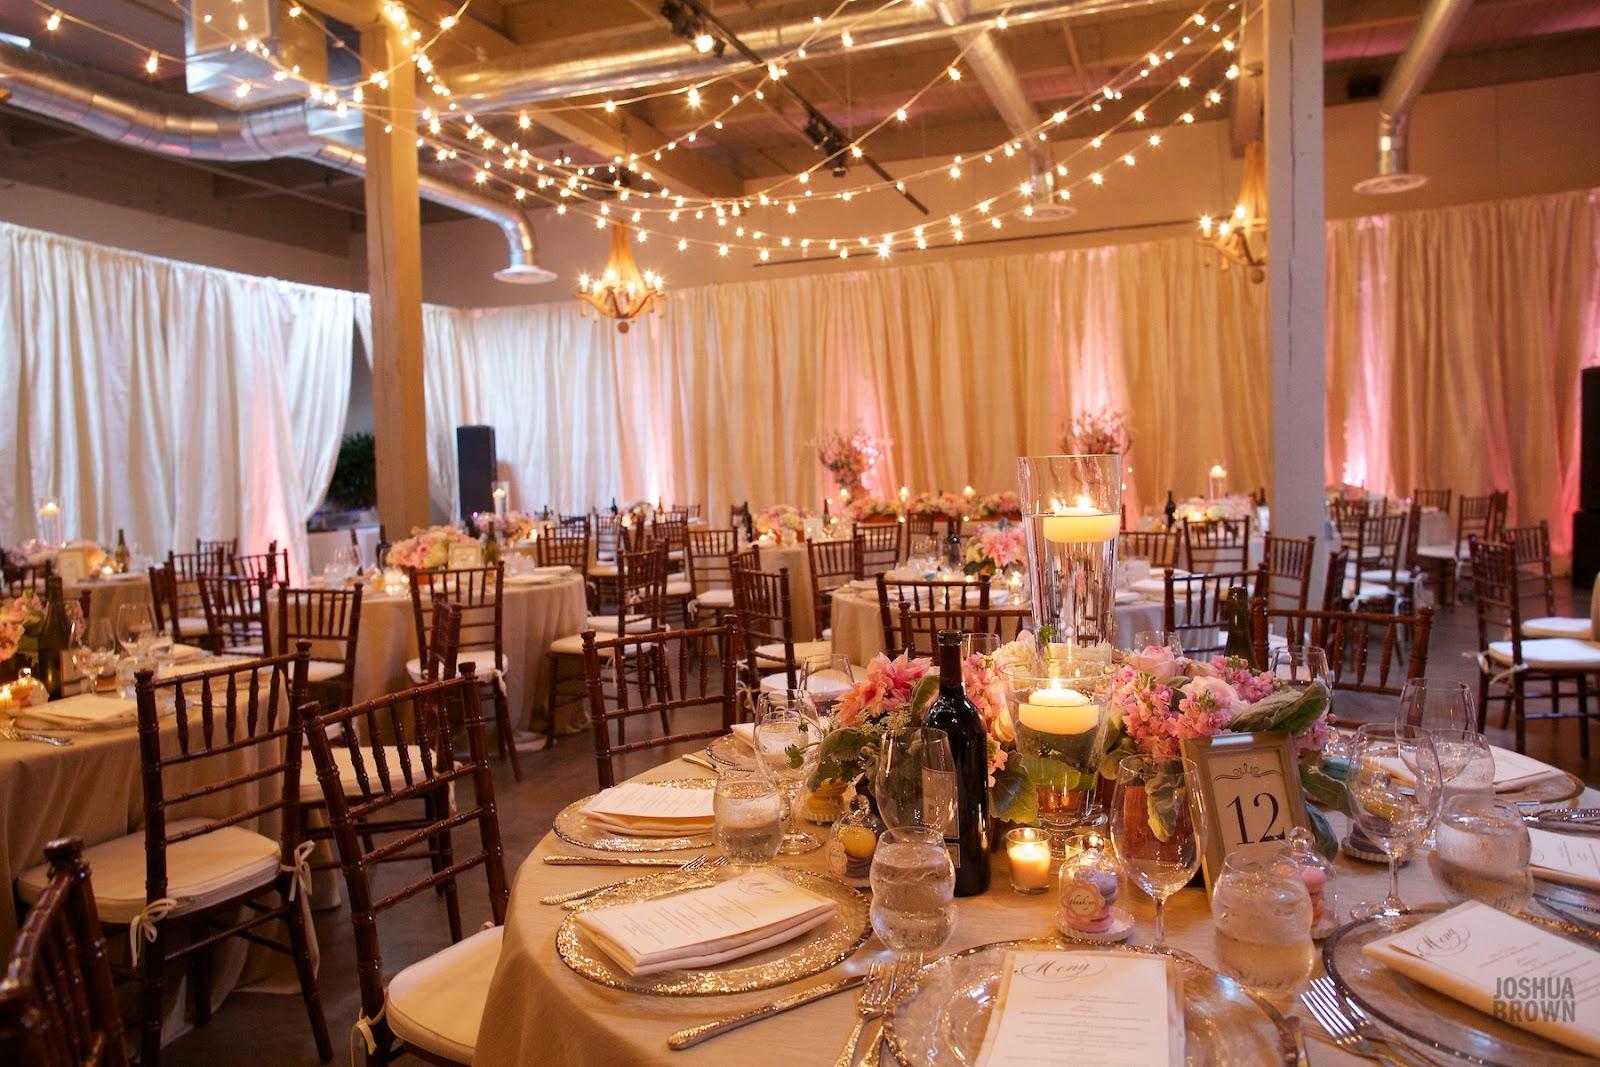 The Blog: A Romantic Vintage Wedding